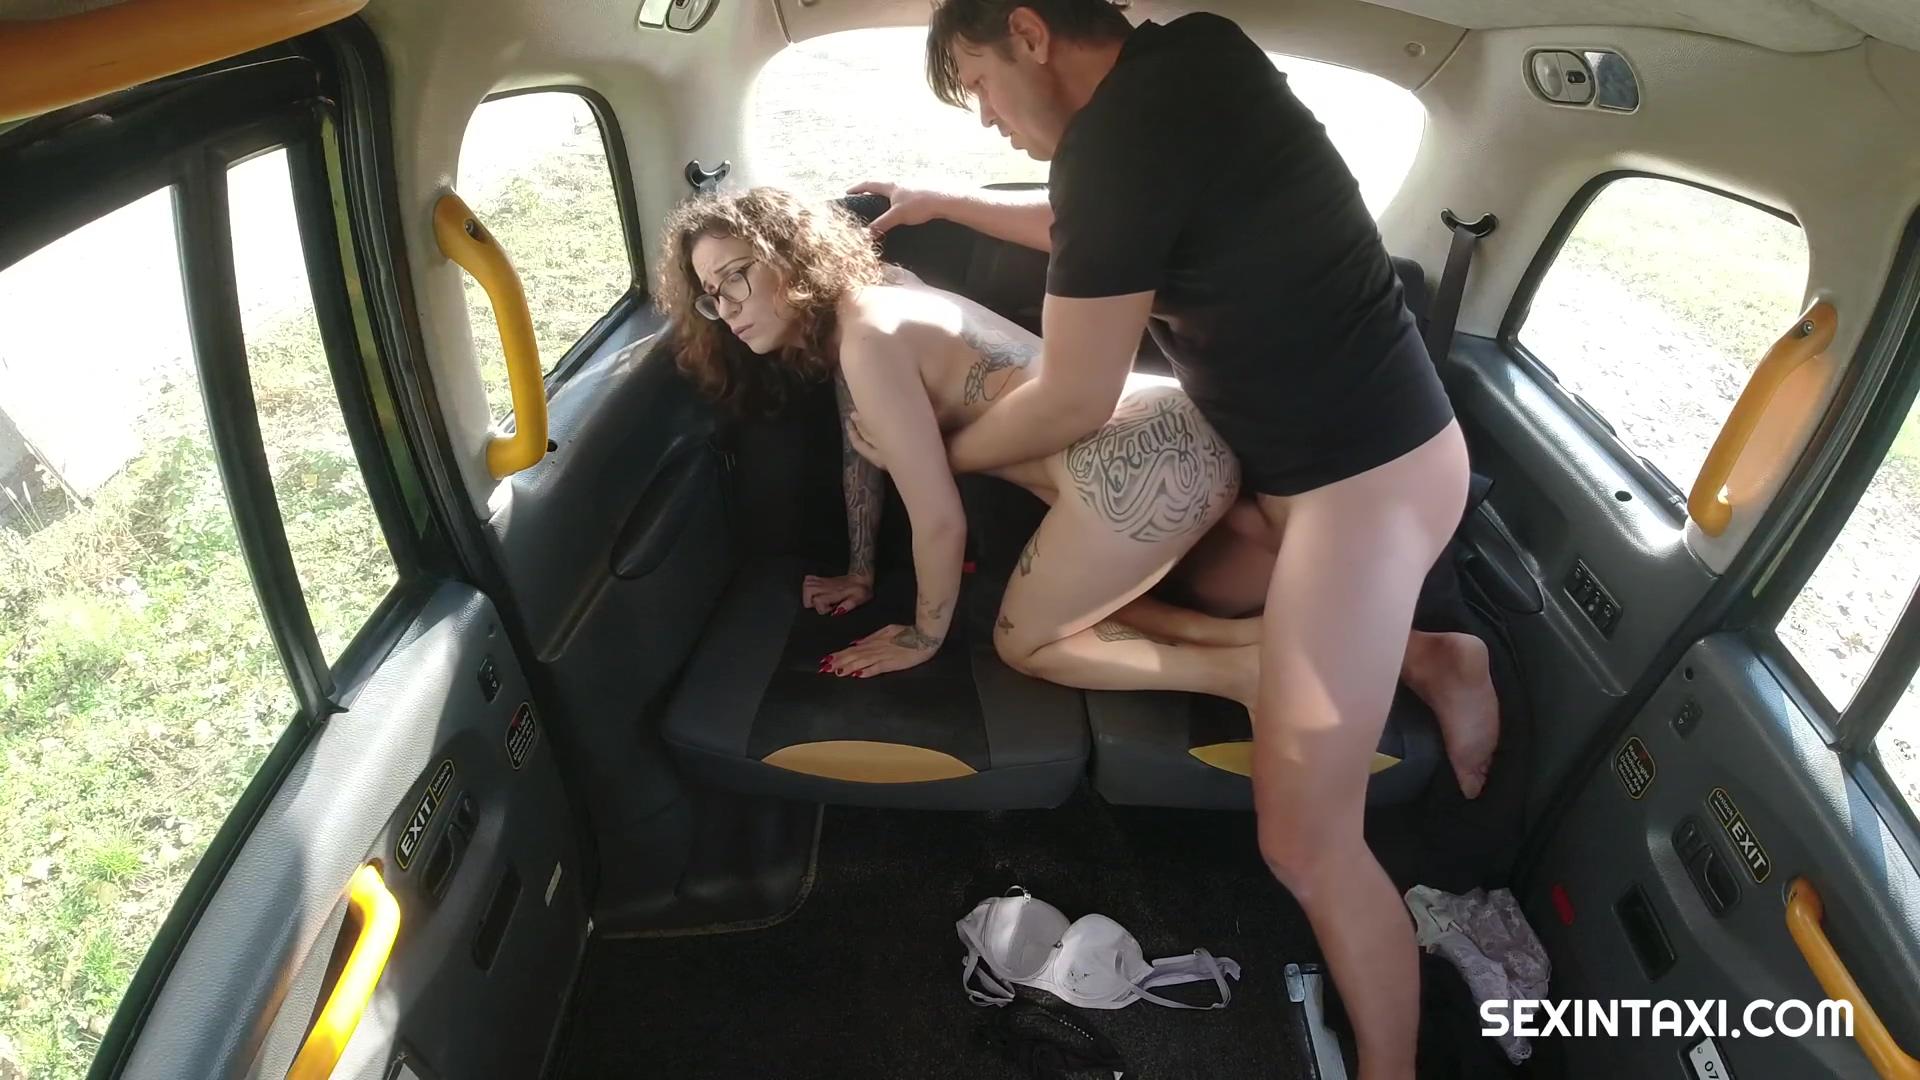 Sexintaxi The Randy Driver Wants A Private Dance E17 Czech Natasha Ink